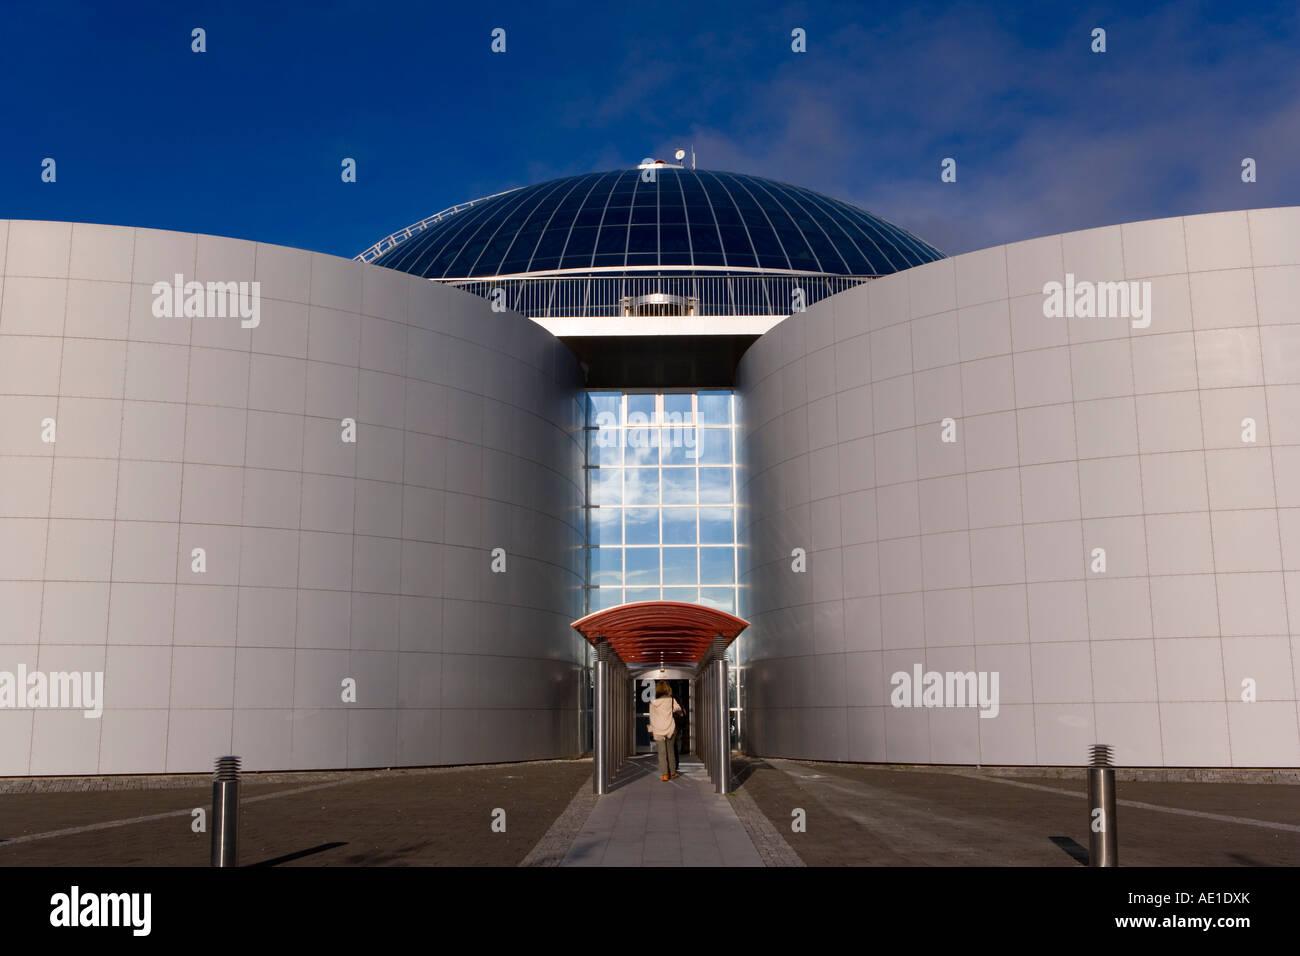 Iceland Reykjavik The Perlan building and Saga Museum - Stock Image